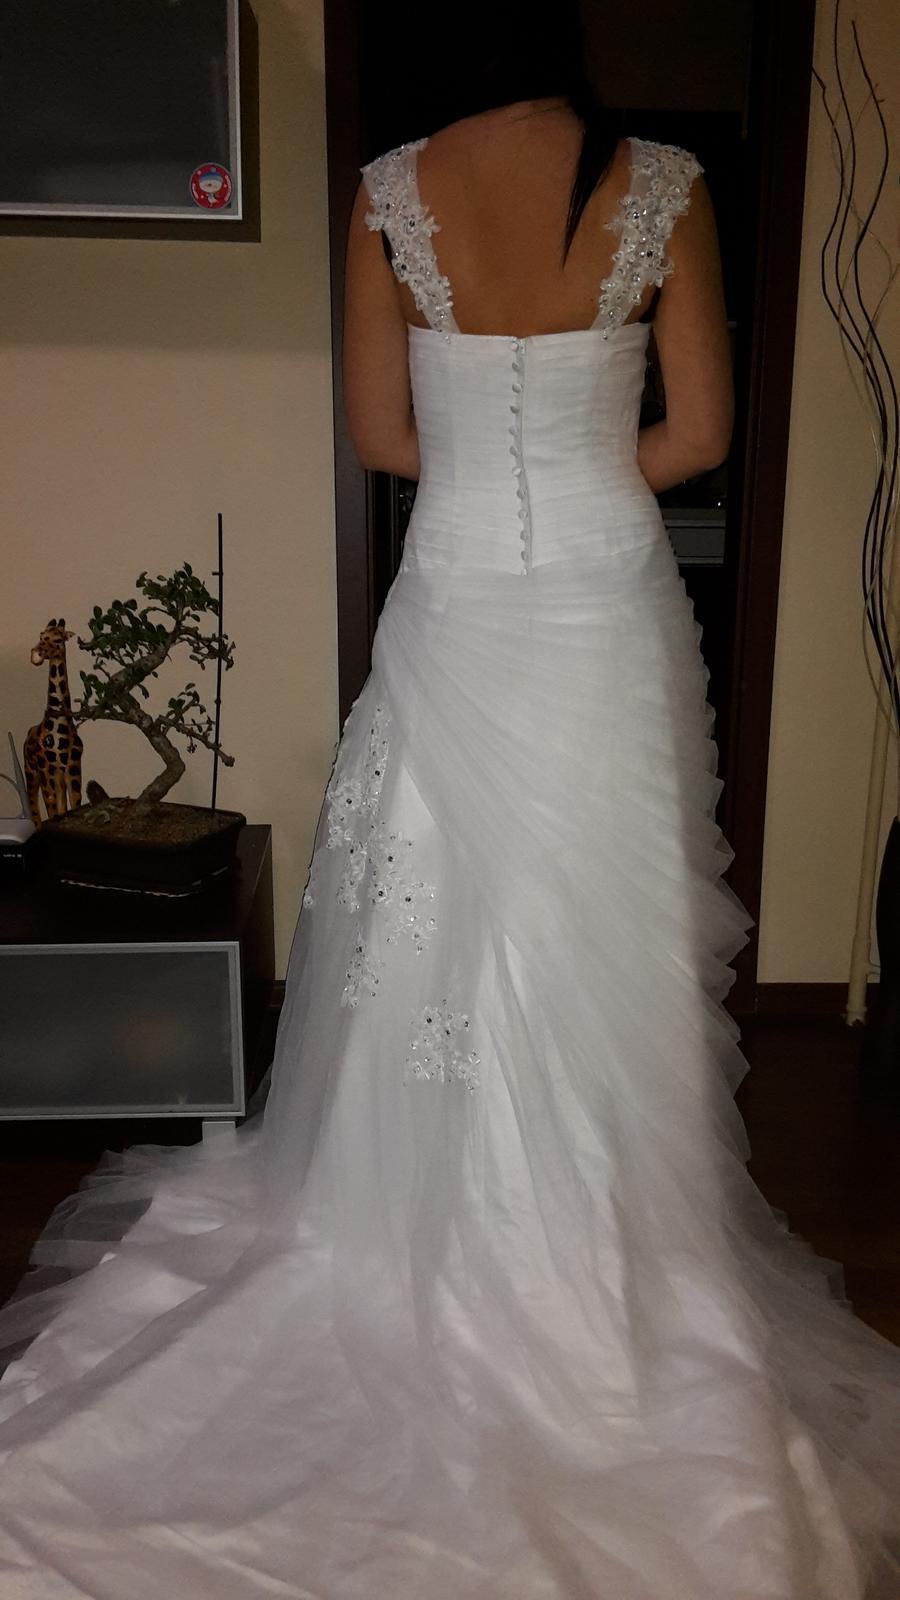 Svadobné šaty (nové) - Obrázok č. 4